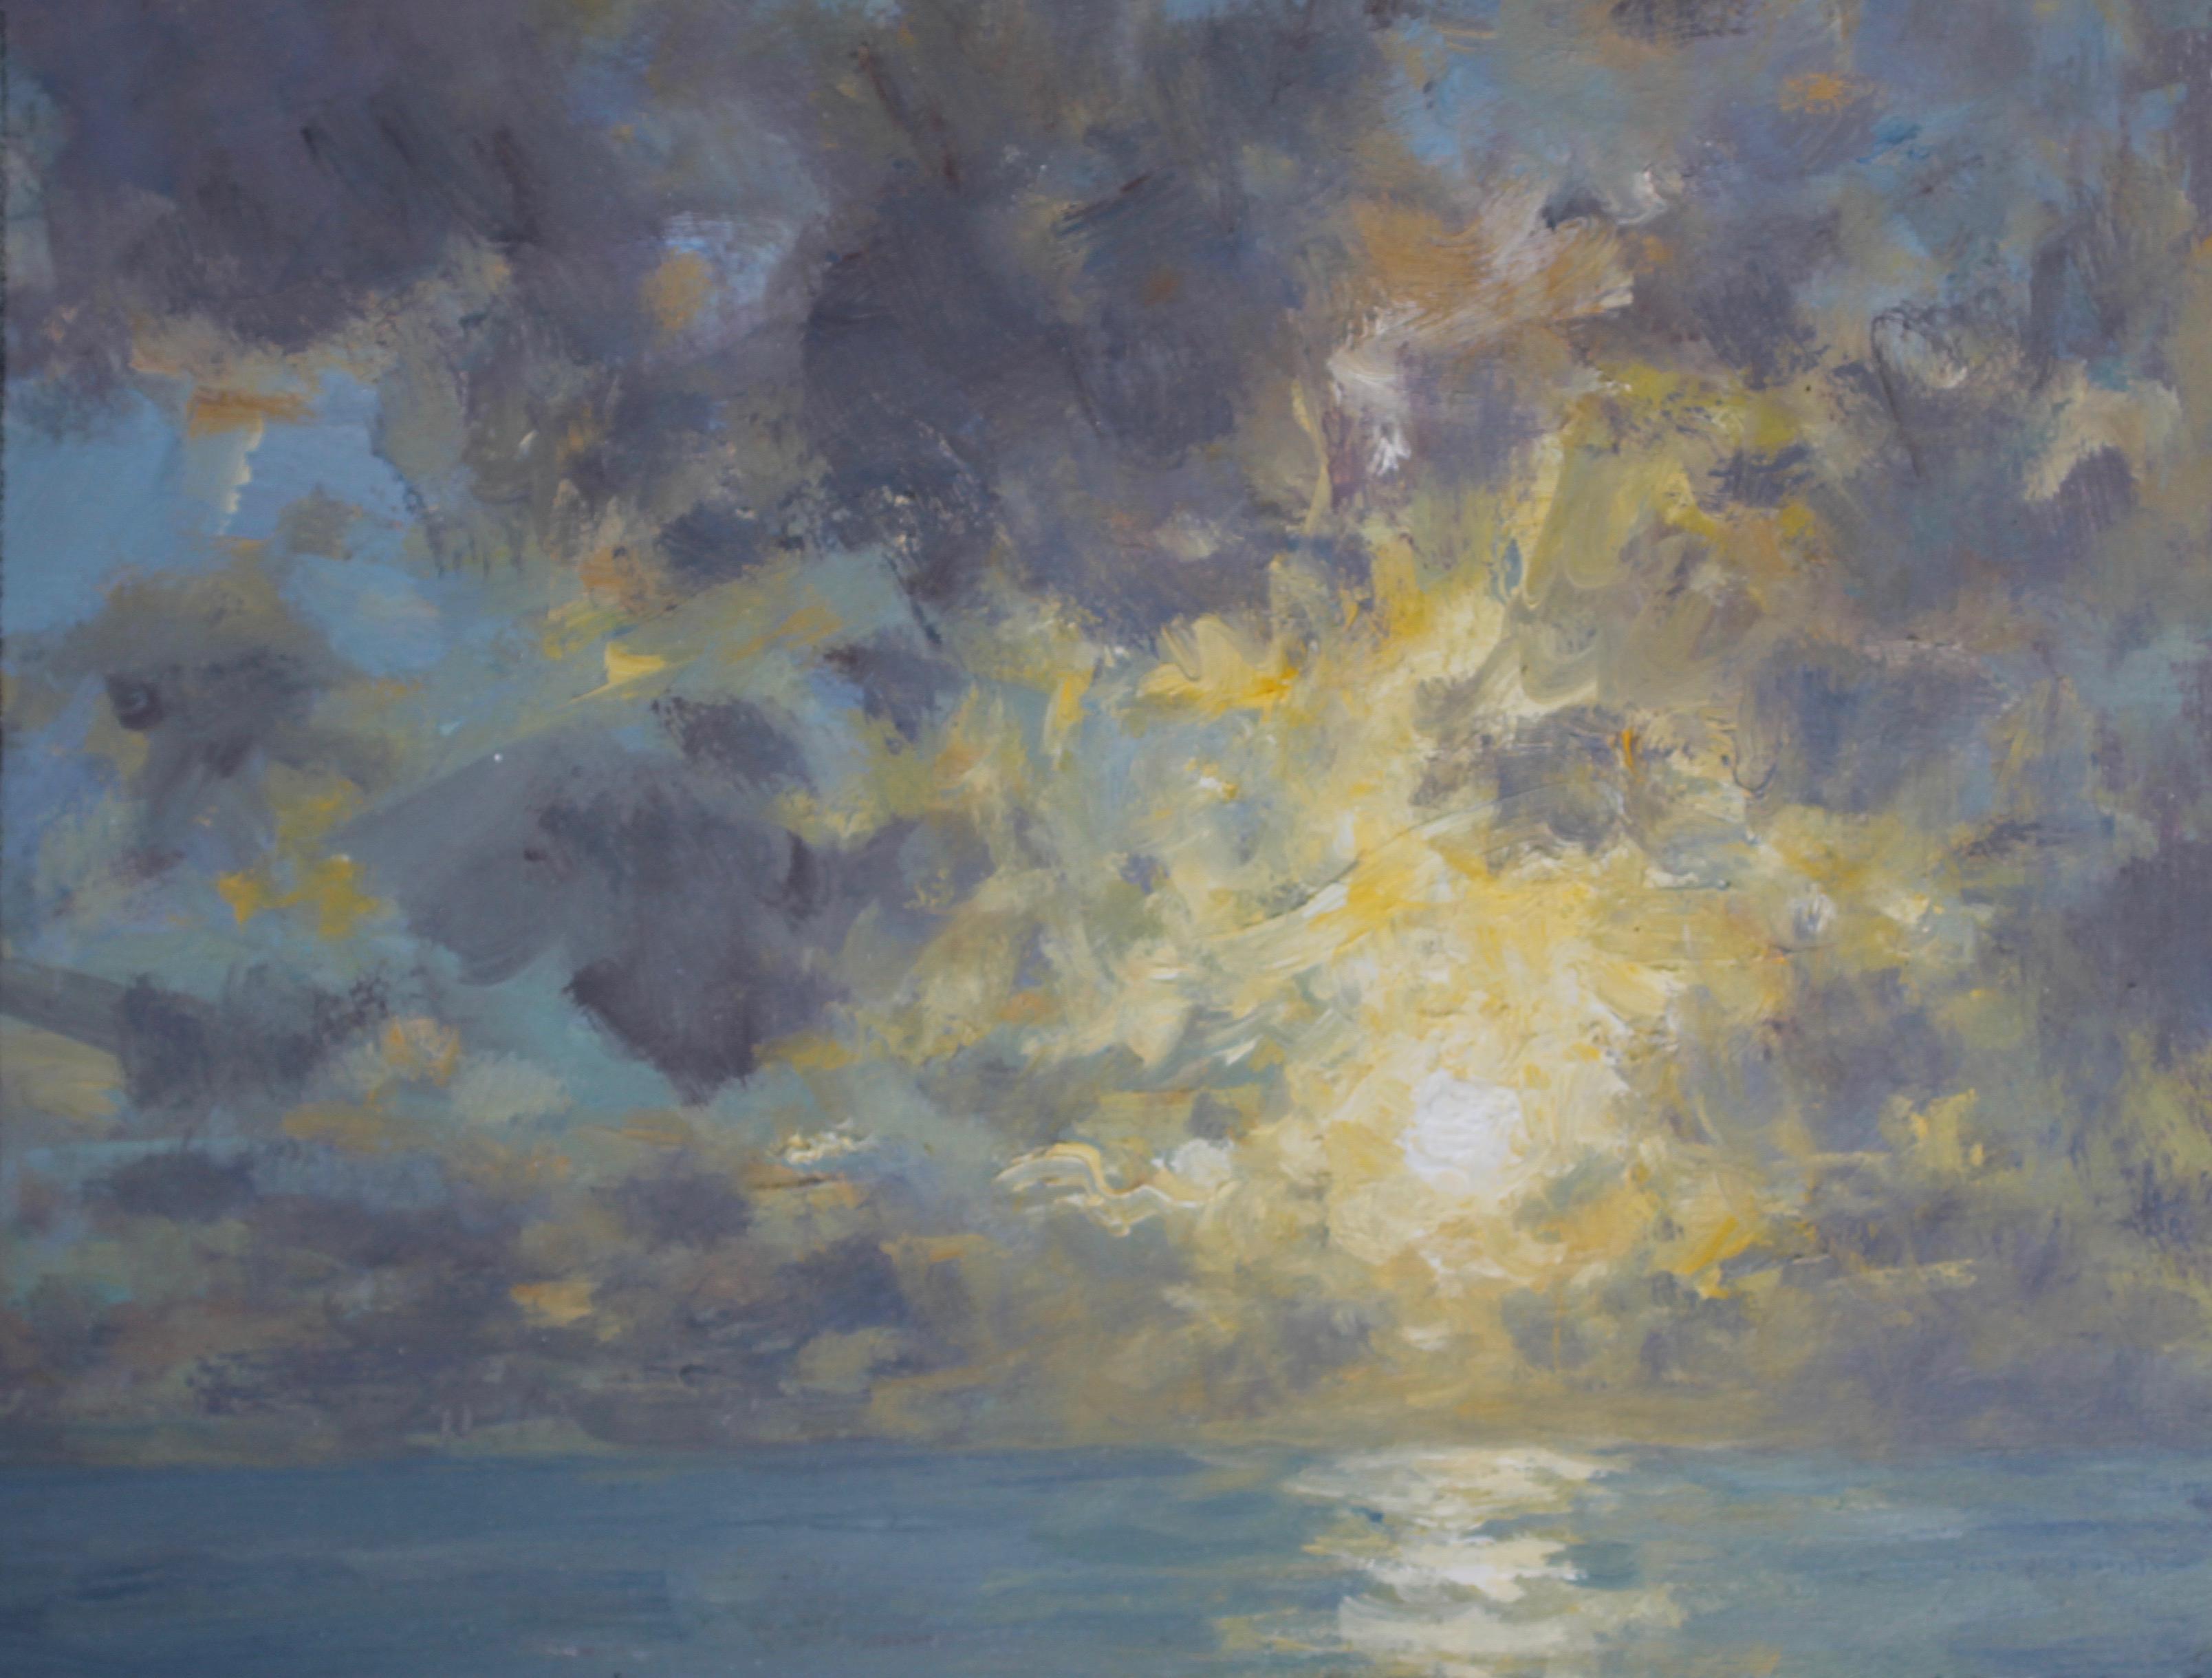 Evening Sky Over the Sea